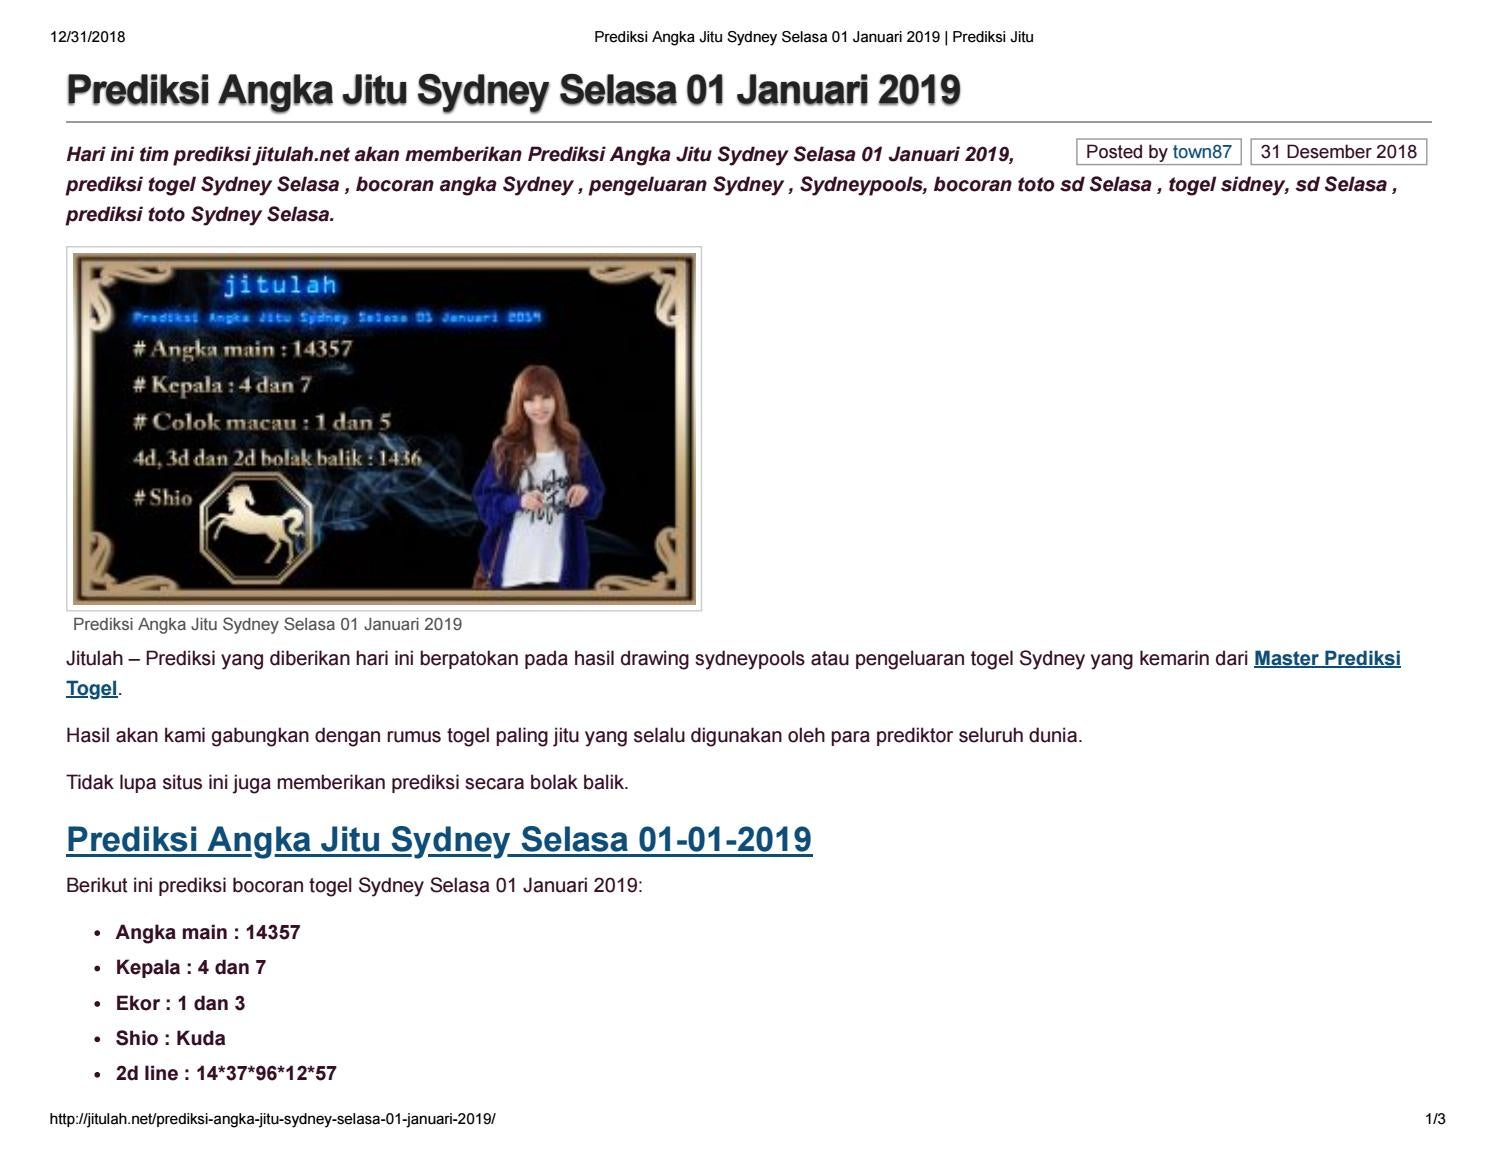 Prediksi Angka Jitu Sydney Selasa 01 Januari 2019 By Angelina1310 Issuu